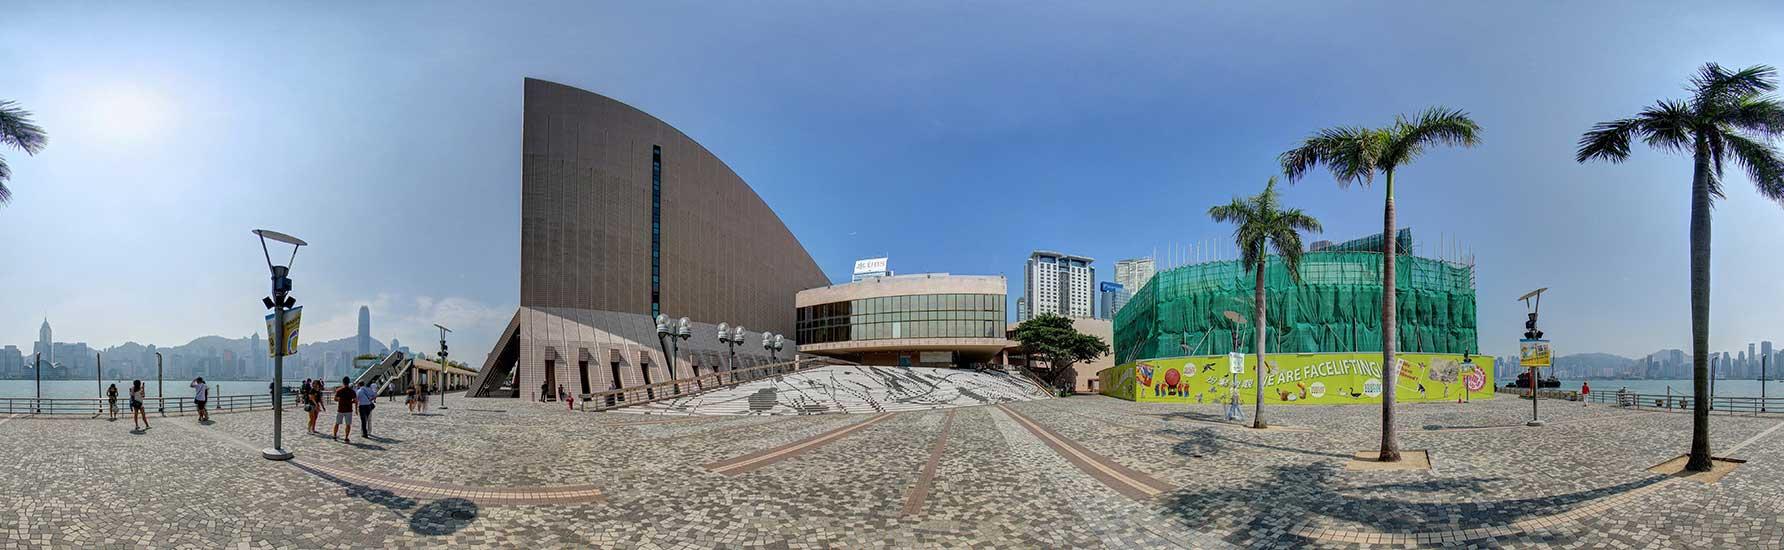 Hong Kong Virtual Tour